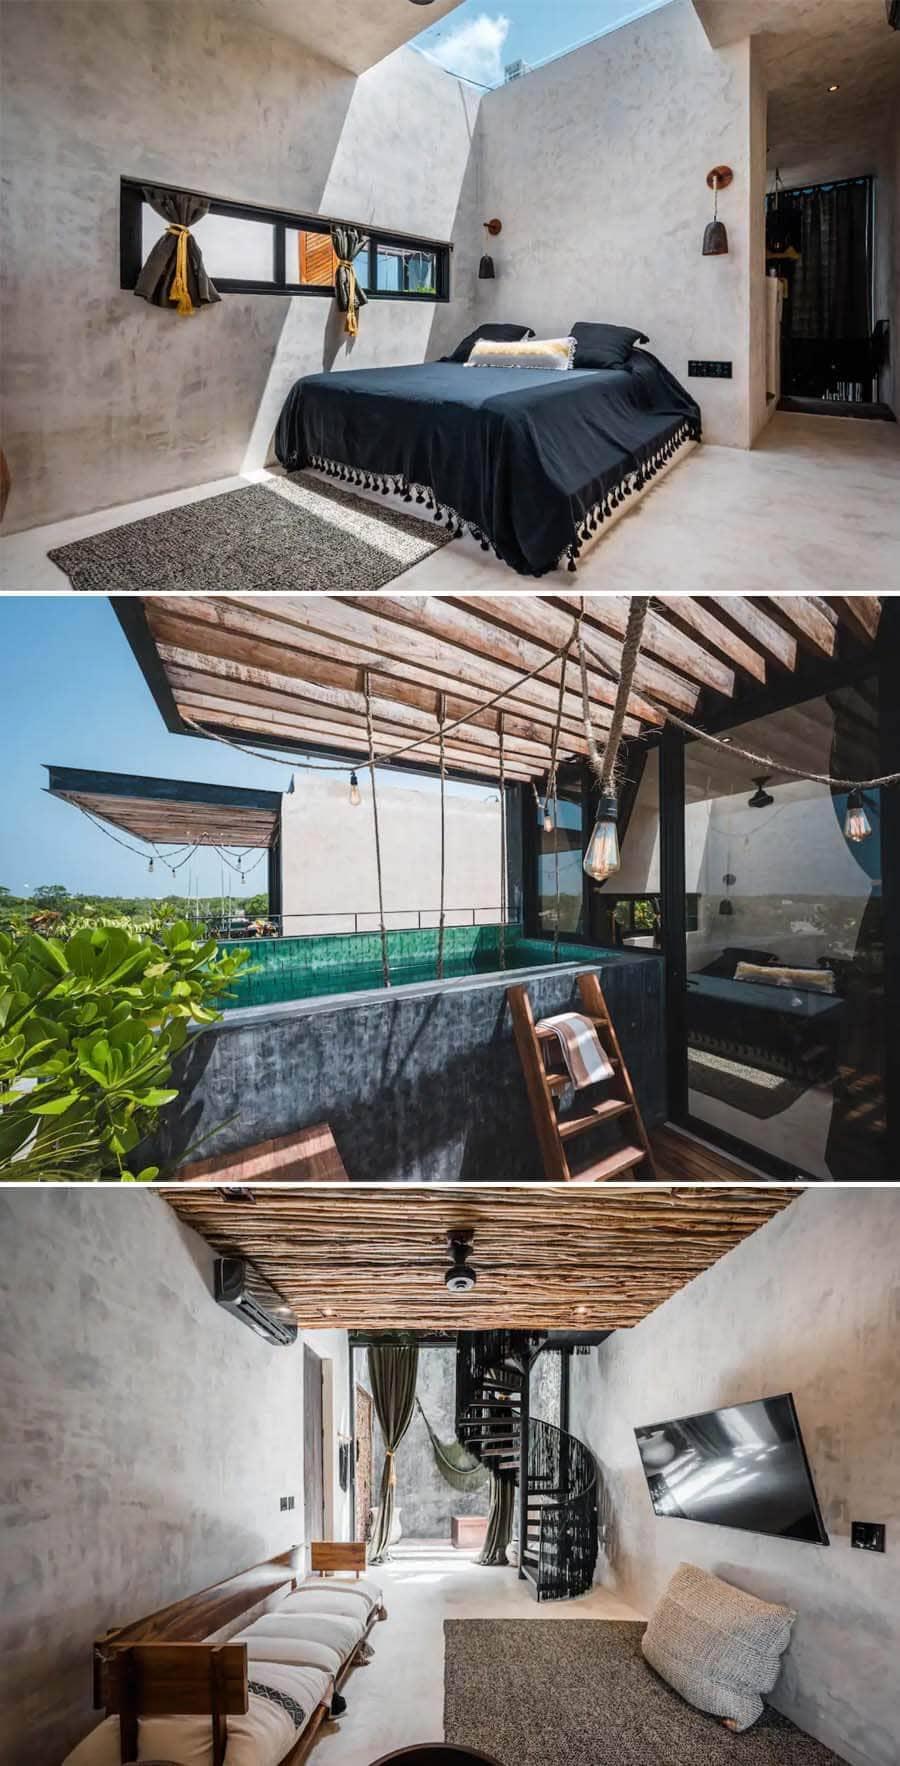 Best Airbnbs in Tulum - penthouse loft apartment